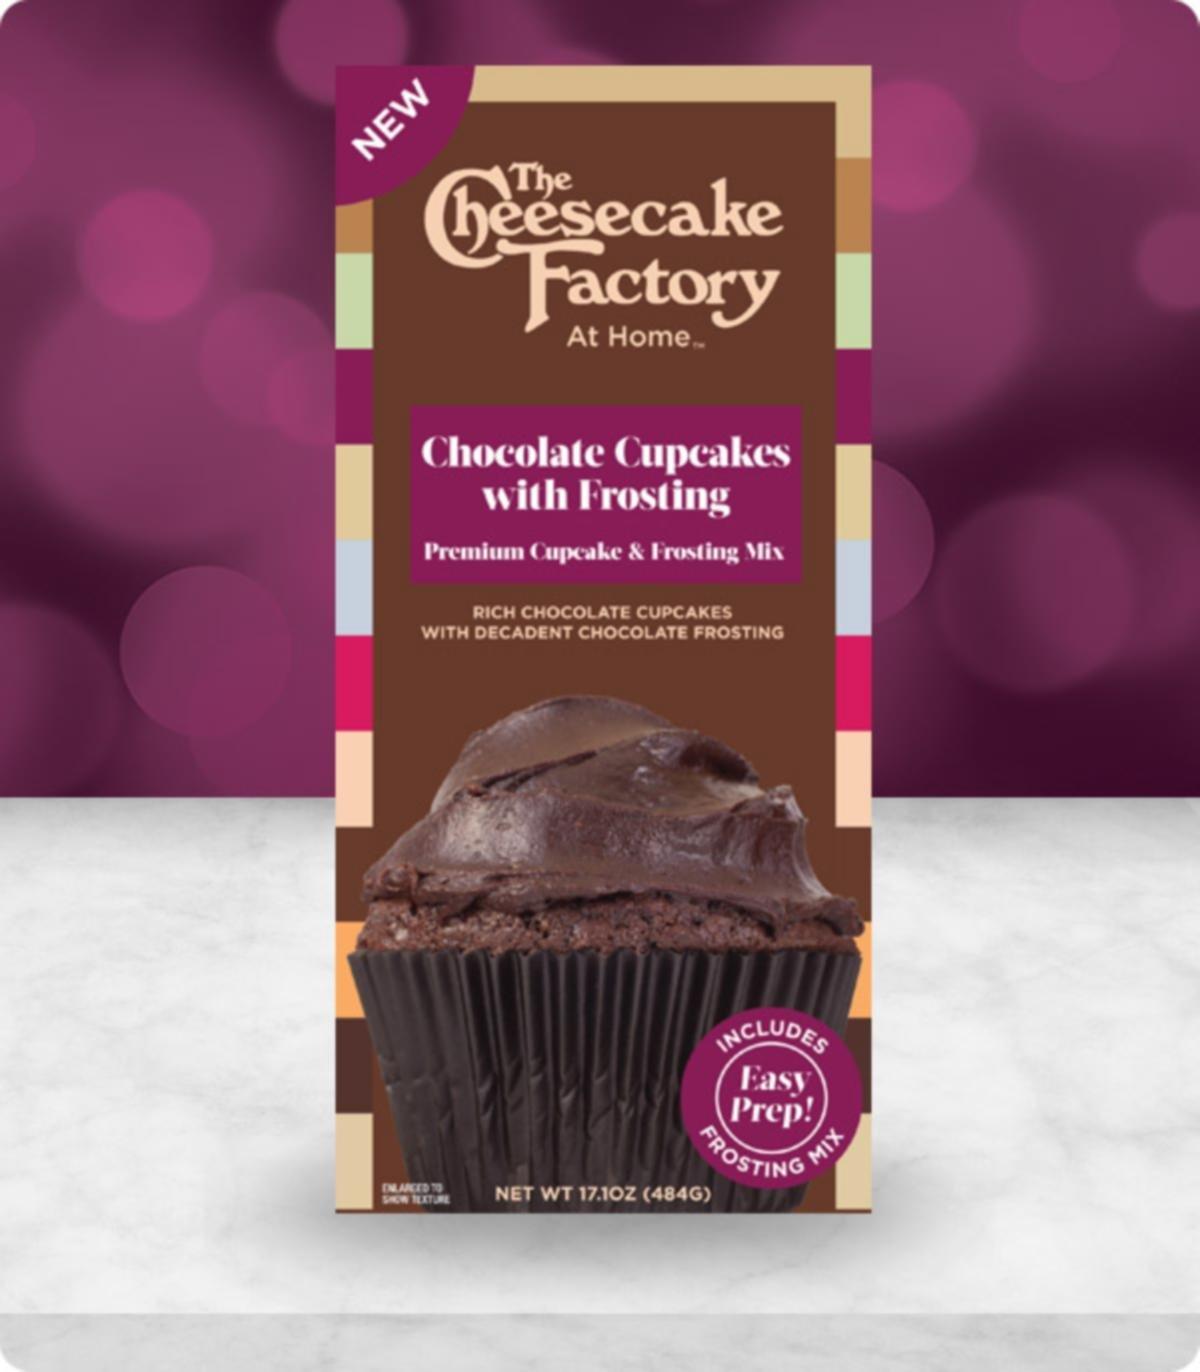 Amazon.com : The Cheesecake Factory at Home Premium Cupcake ...